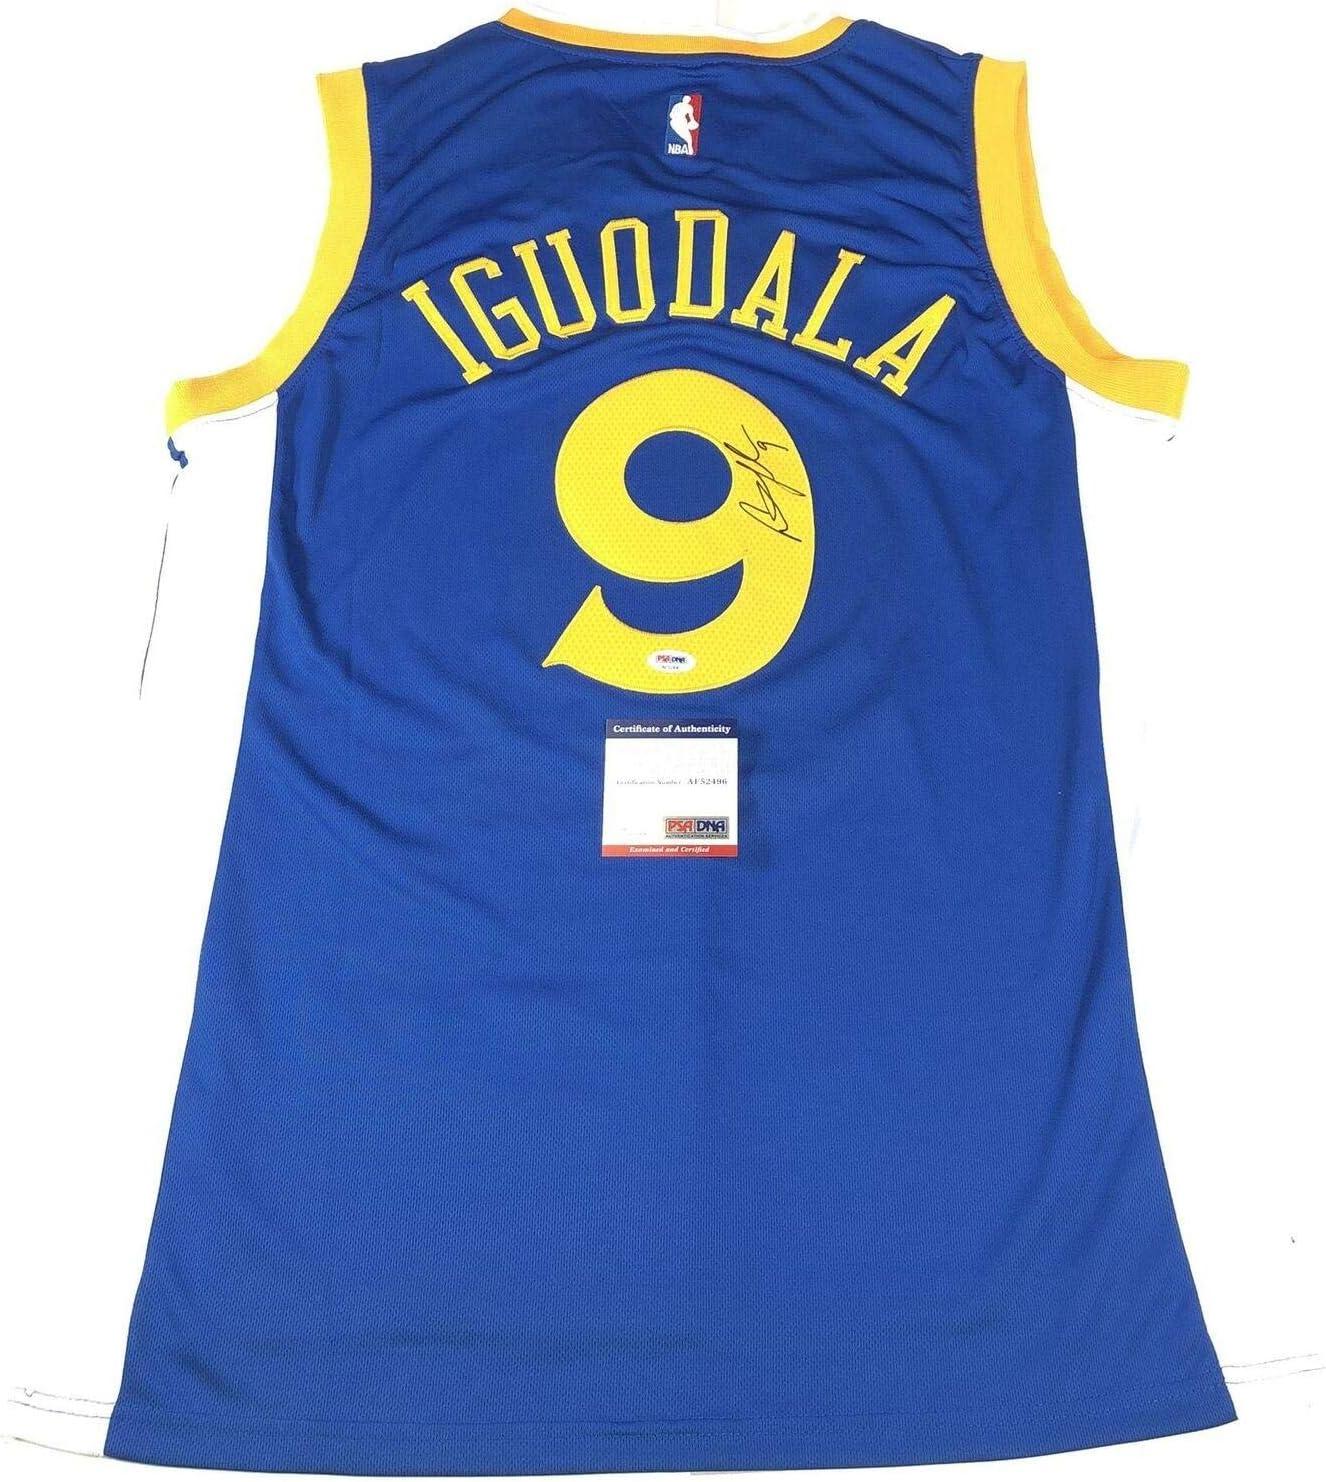 Andre Iguodala Signed Jersey PSA/DNA Golden State Warriors ...